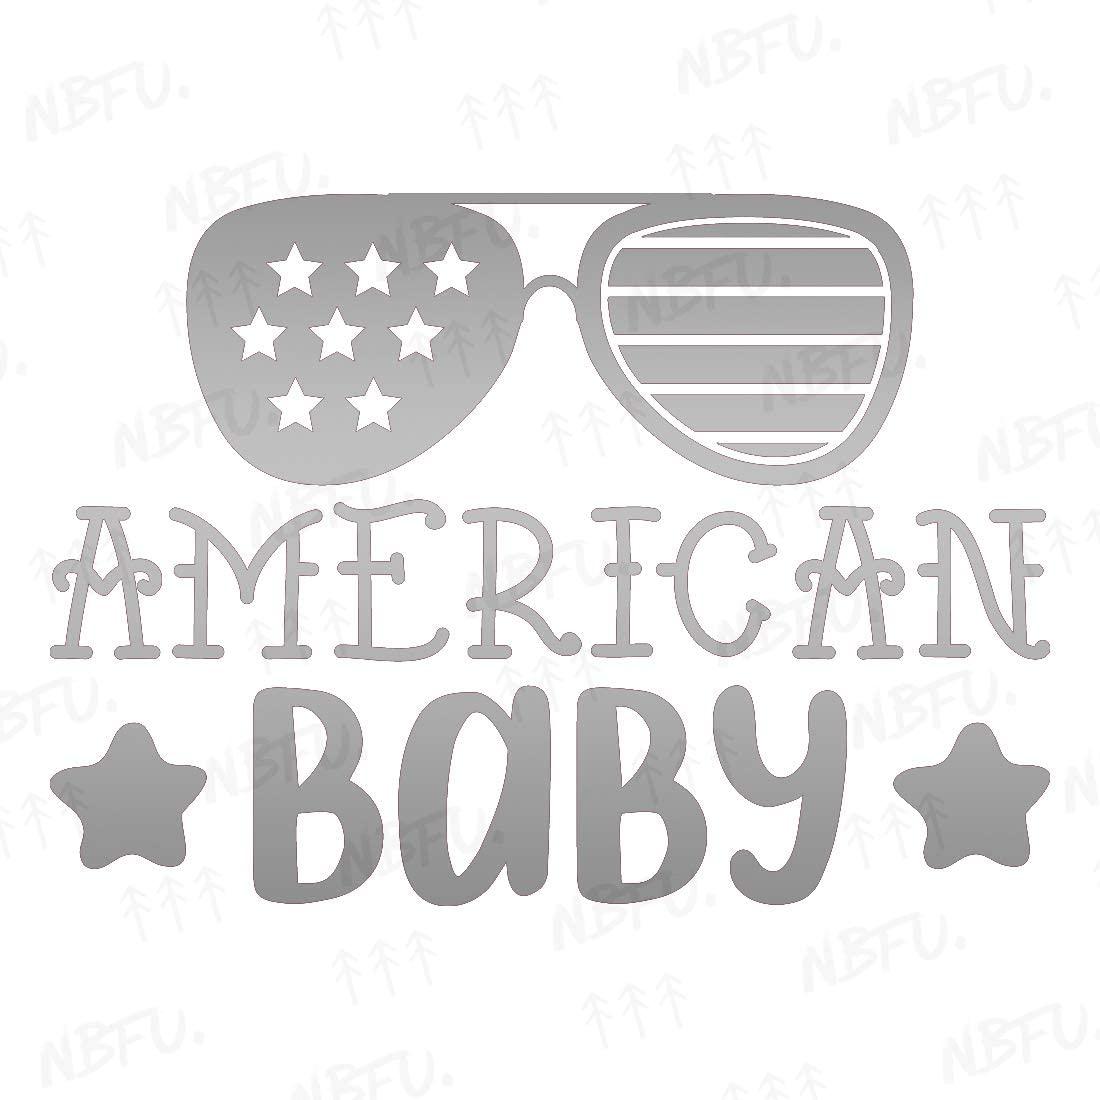 NBFU Decals American Baby Glasses Star 1 (Metallic Silver) (Set of 2) Premium Waterproof Vinyl Decal Stickers for Laptop Phone Accessory Helmet Car Window Bumper Mug Tuber Cup Door Wall Decoration